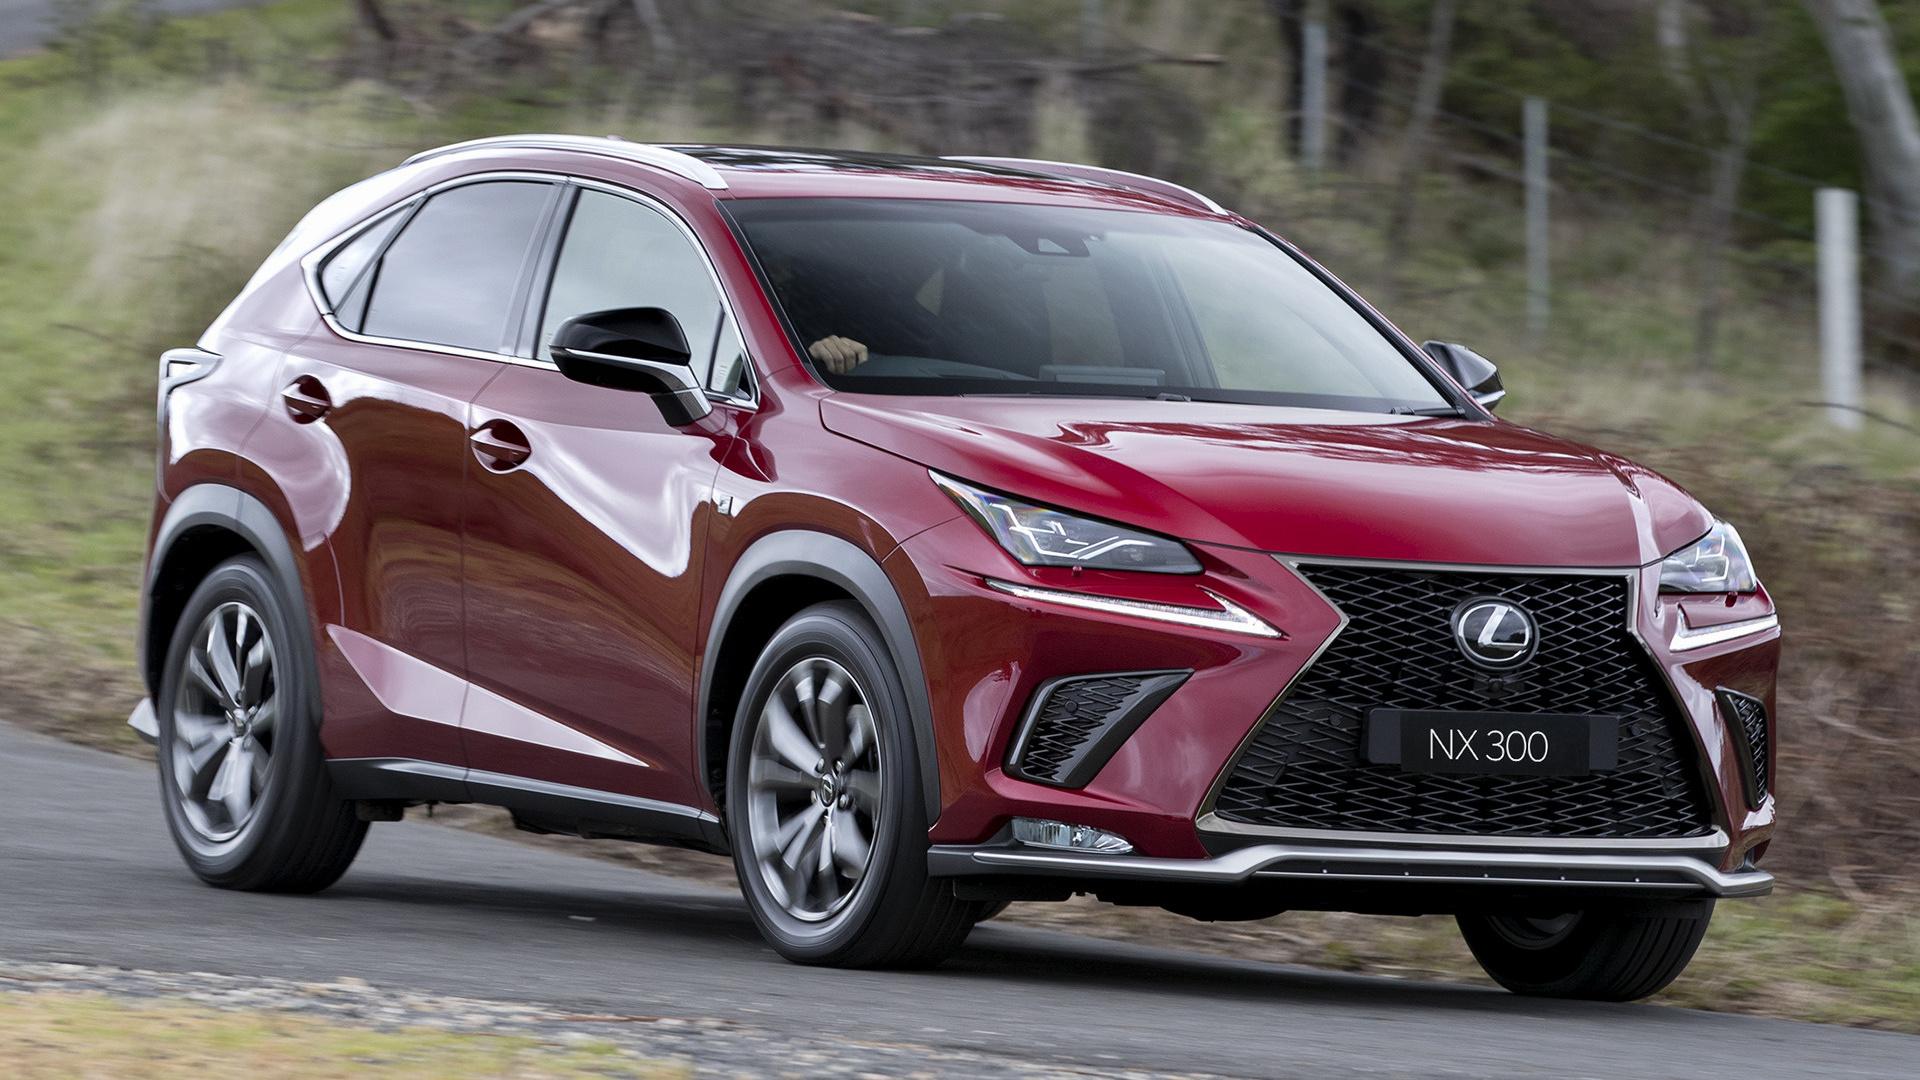 Lexus Nx Hybrid >> 2017 Lexus NX F Sport (AU) - Wallpapers and HD Images ...